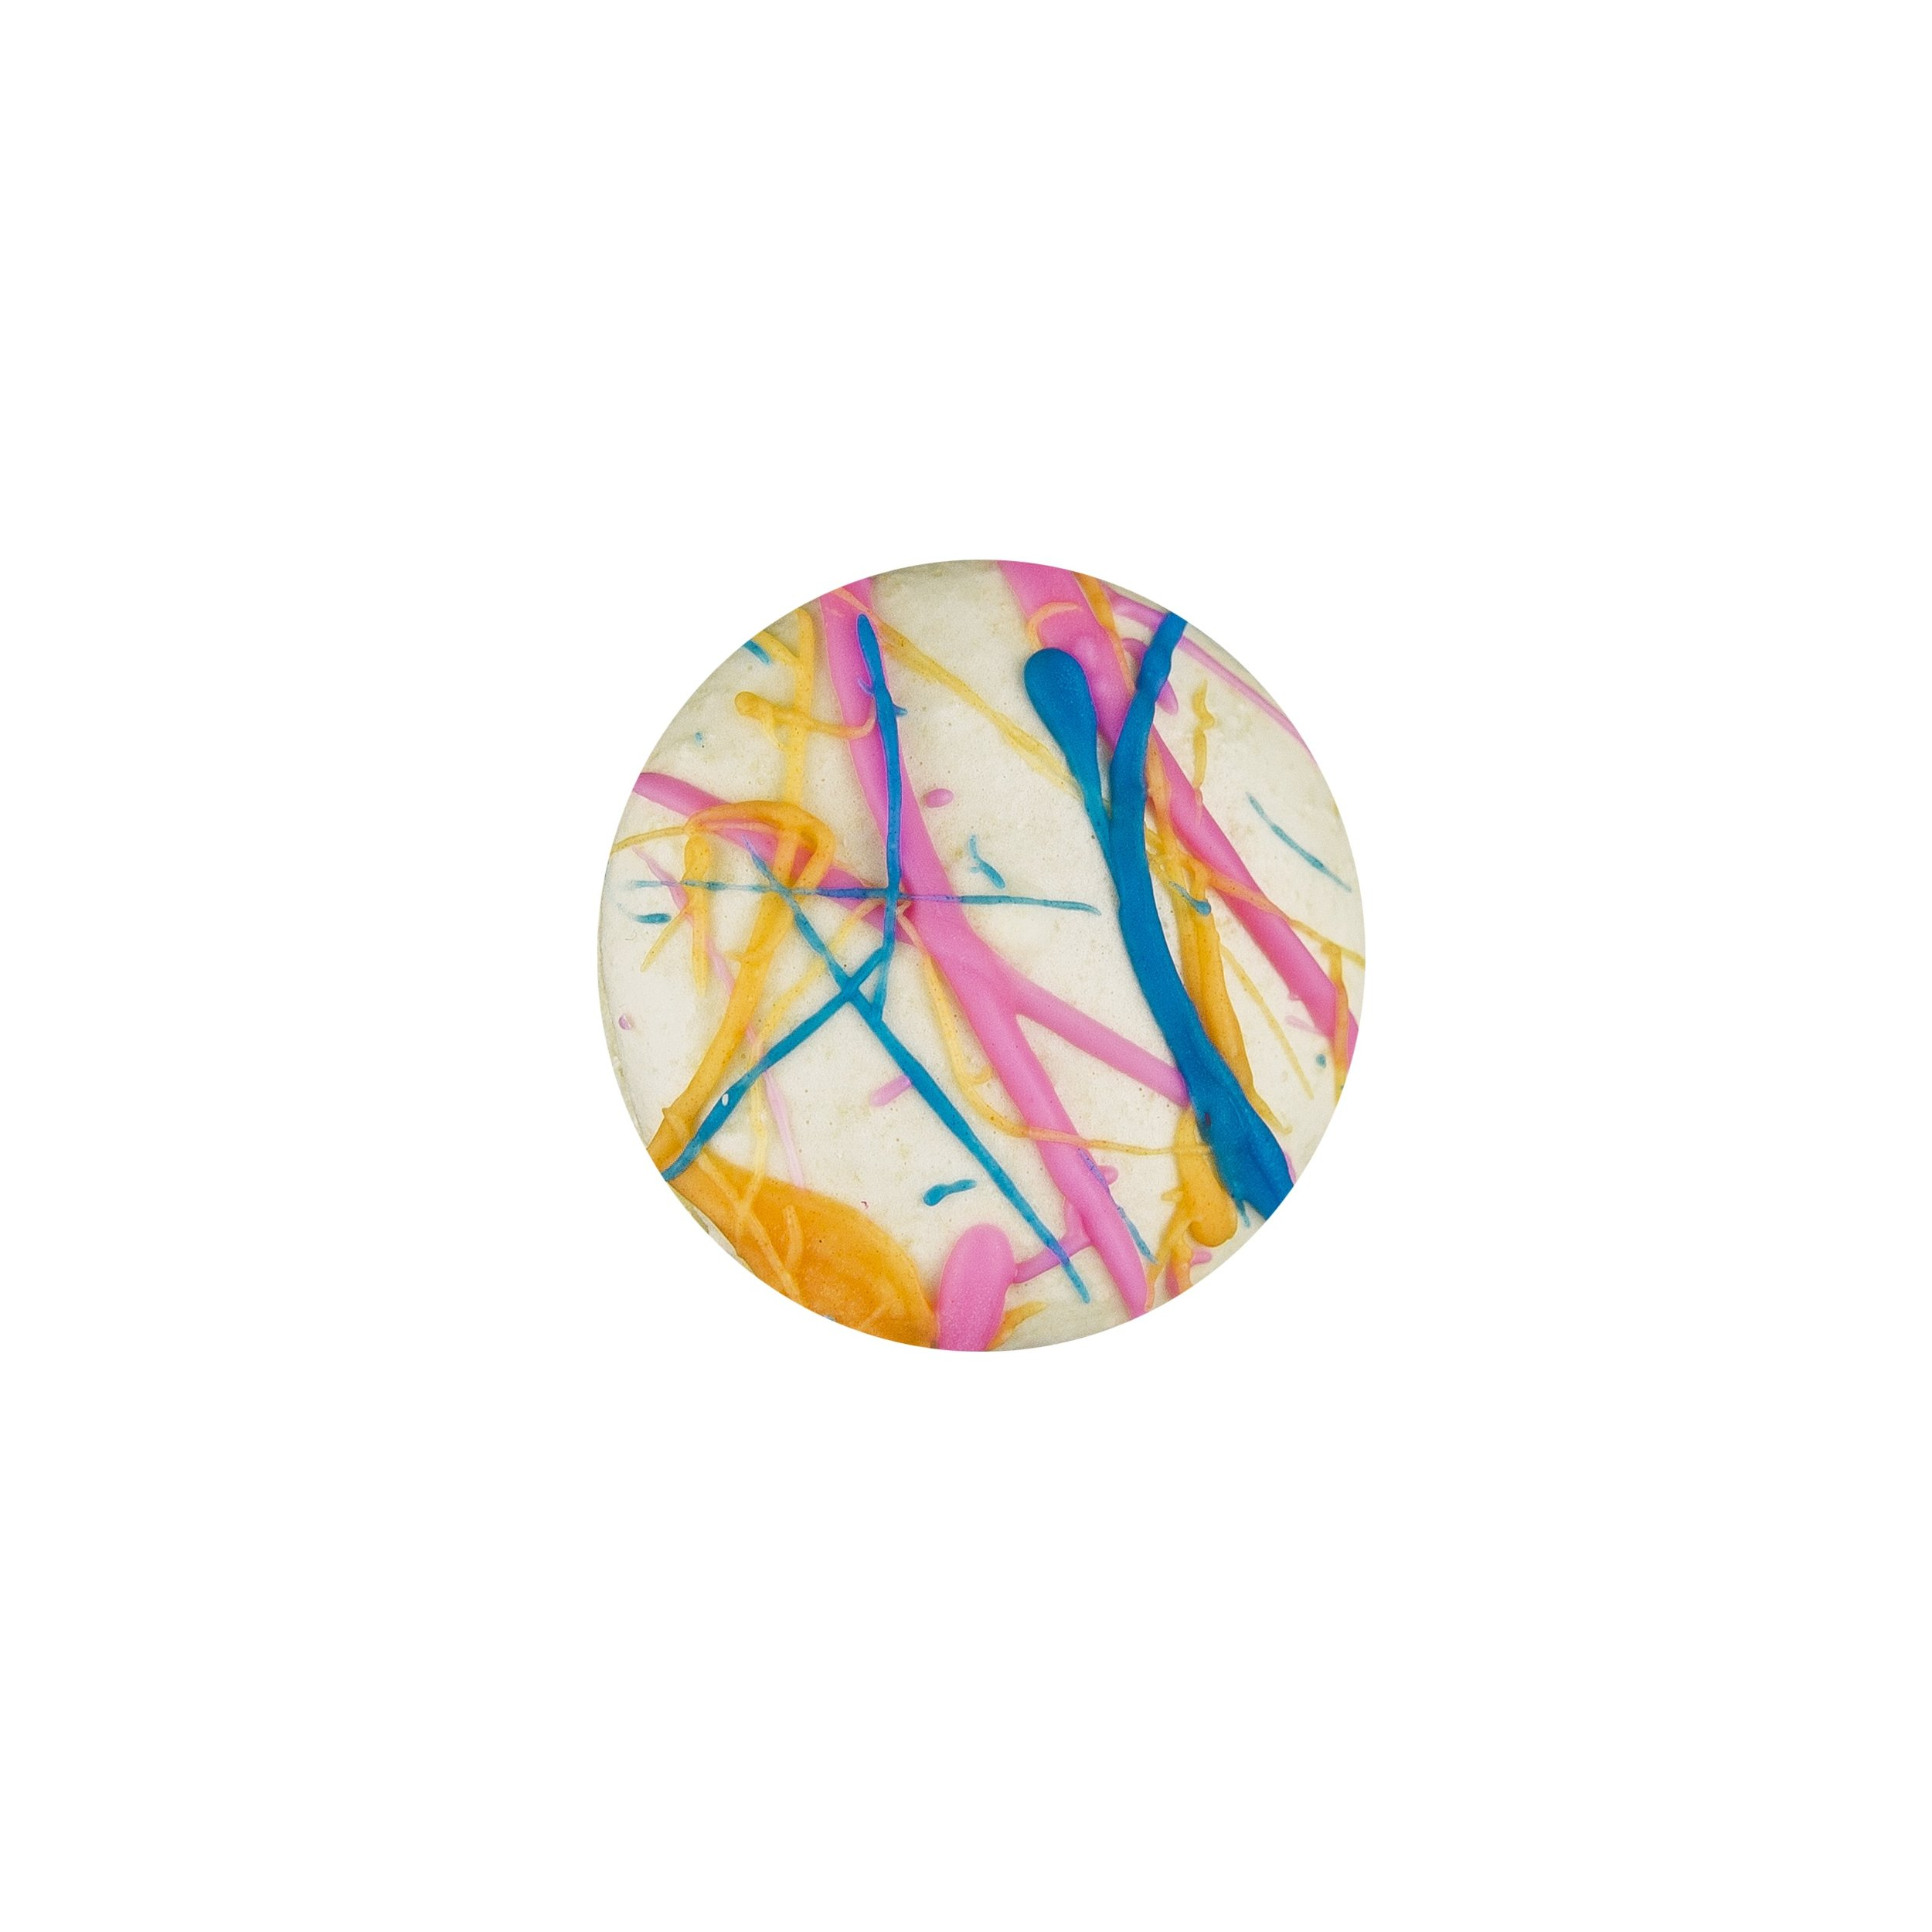 SPLATTER MACARON - WHITE CHOCOLATE VANILLA ALMOND SHELLS+ PINK VANILLA BUTTERCREAM FILLING